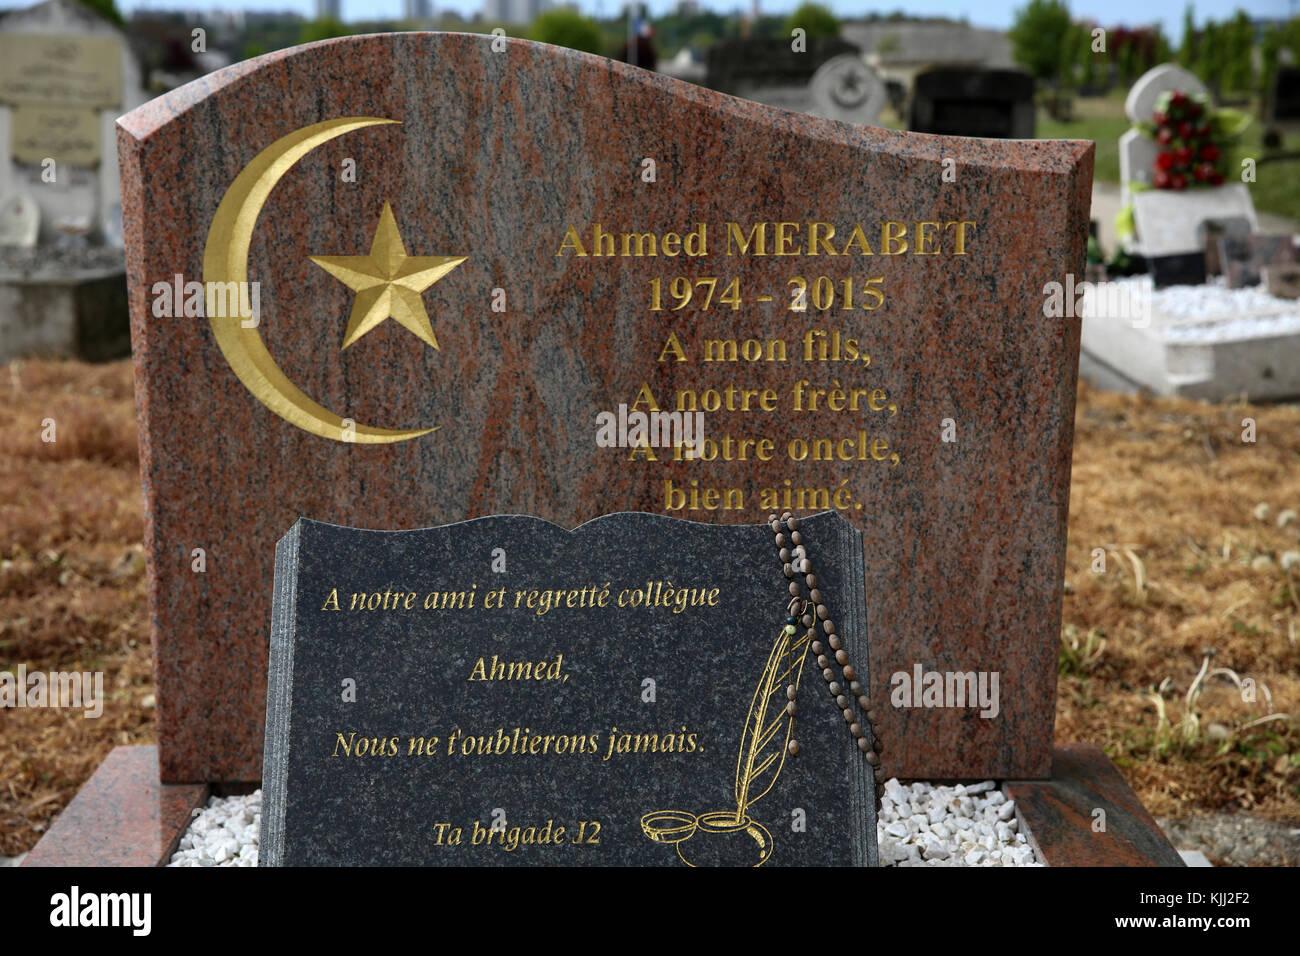 Muslim graveyard in Bobigny, France. Ahmet Merabet's grave (first victim of the Charlie Hebdo killings). - Stock Image